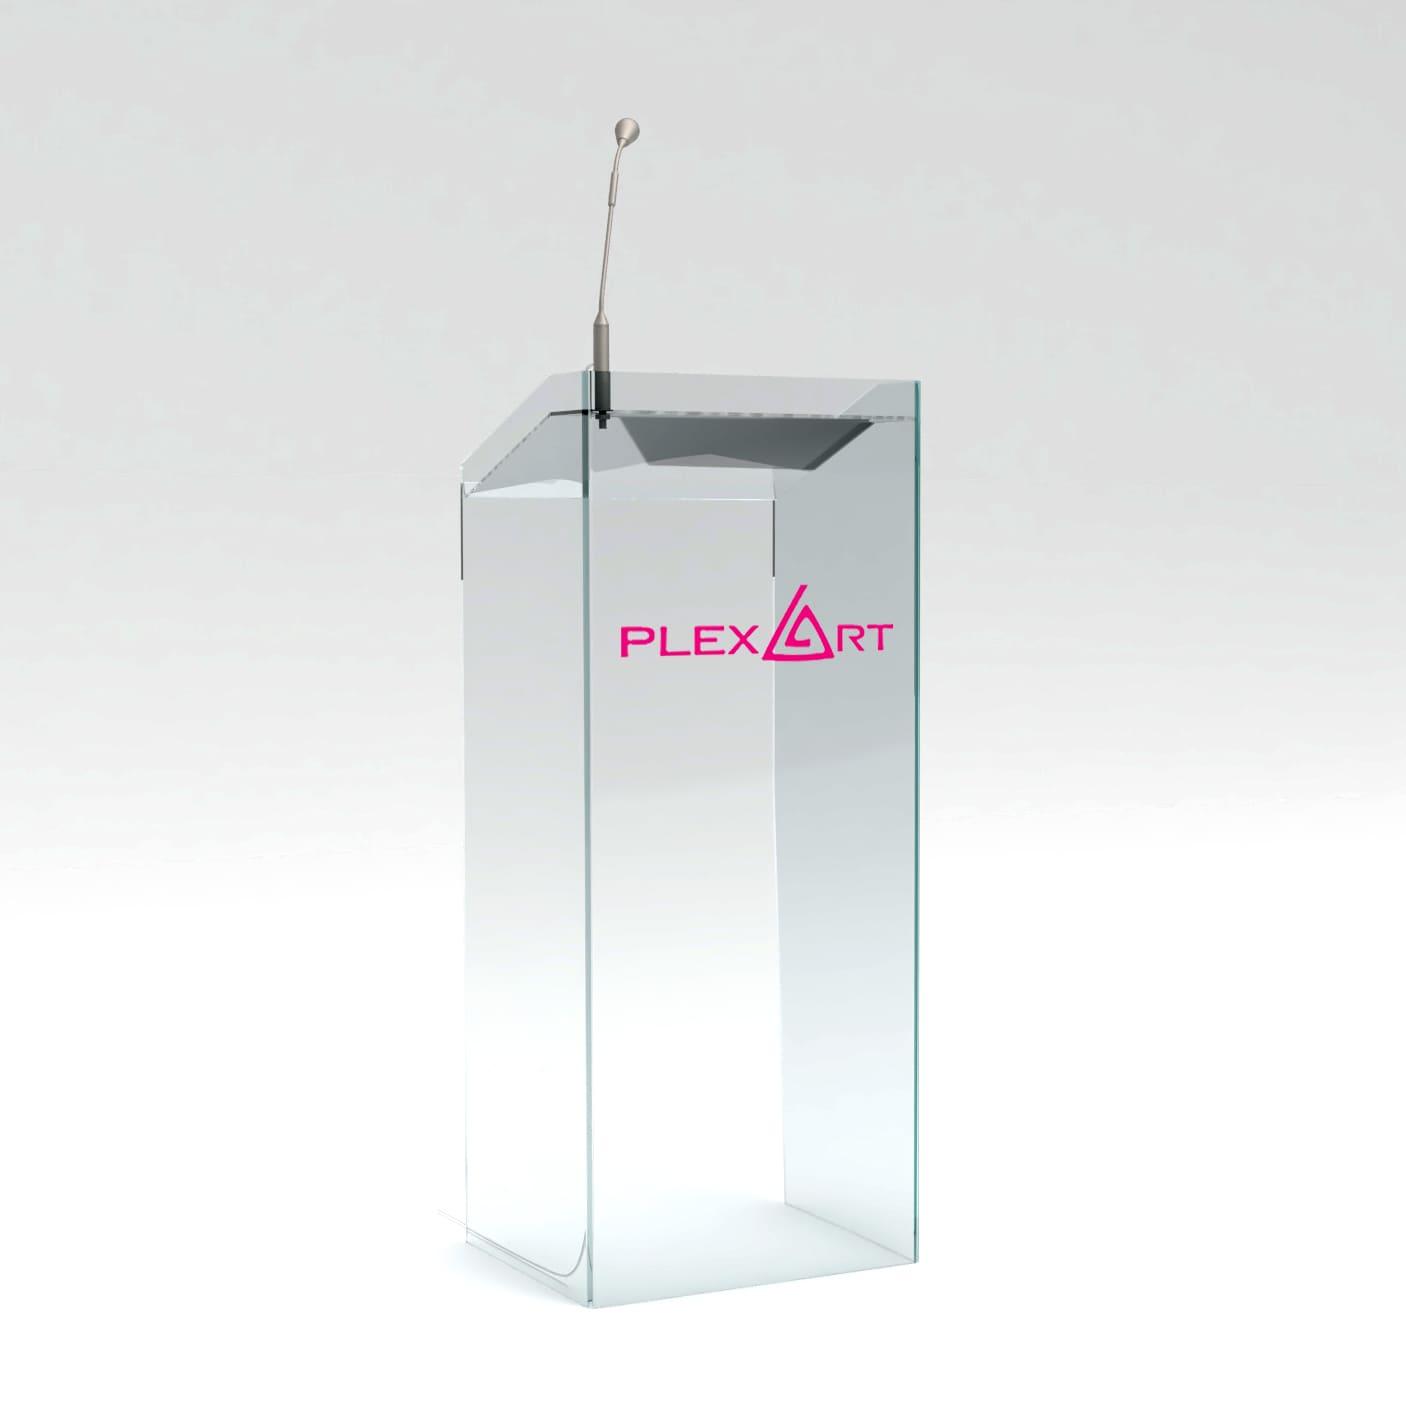 mownica_mikrofon_logo